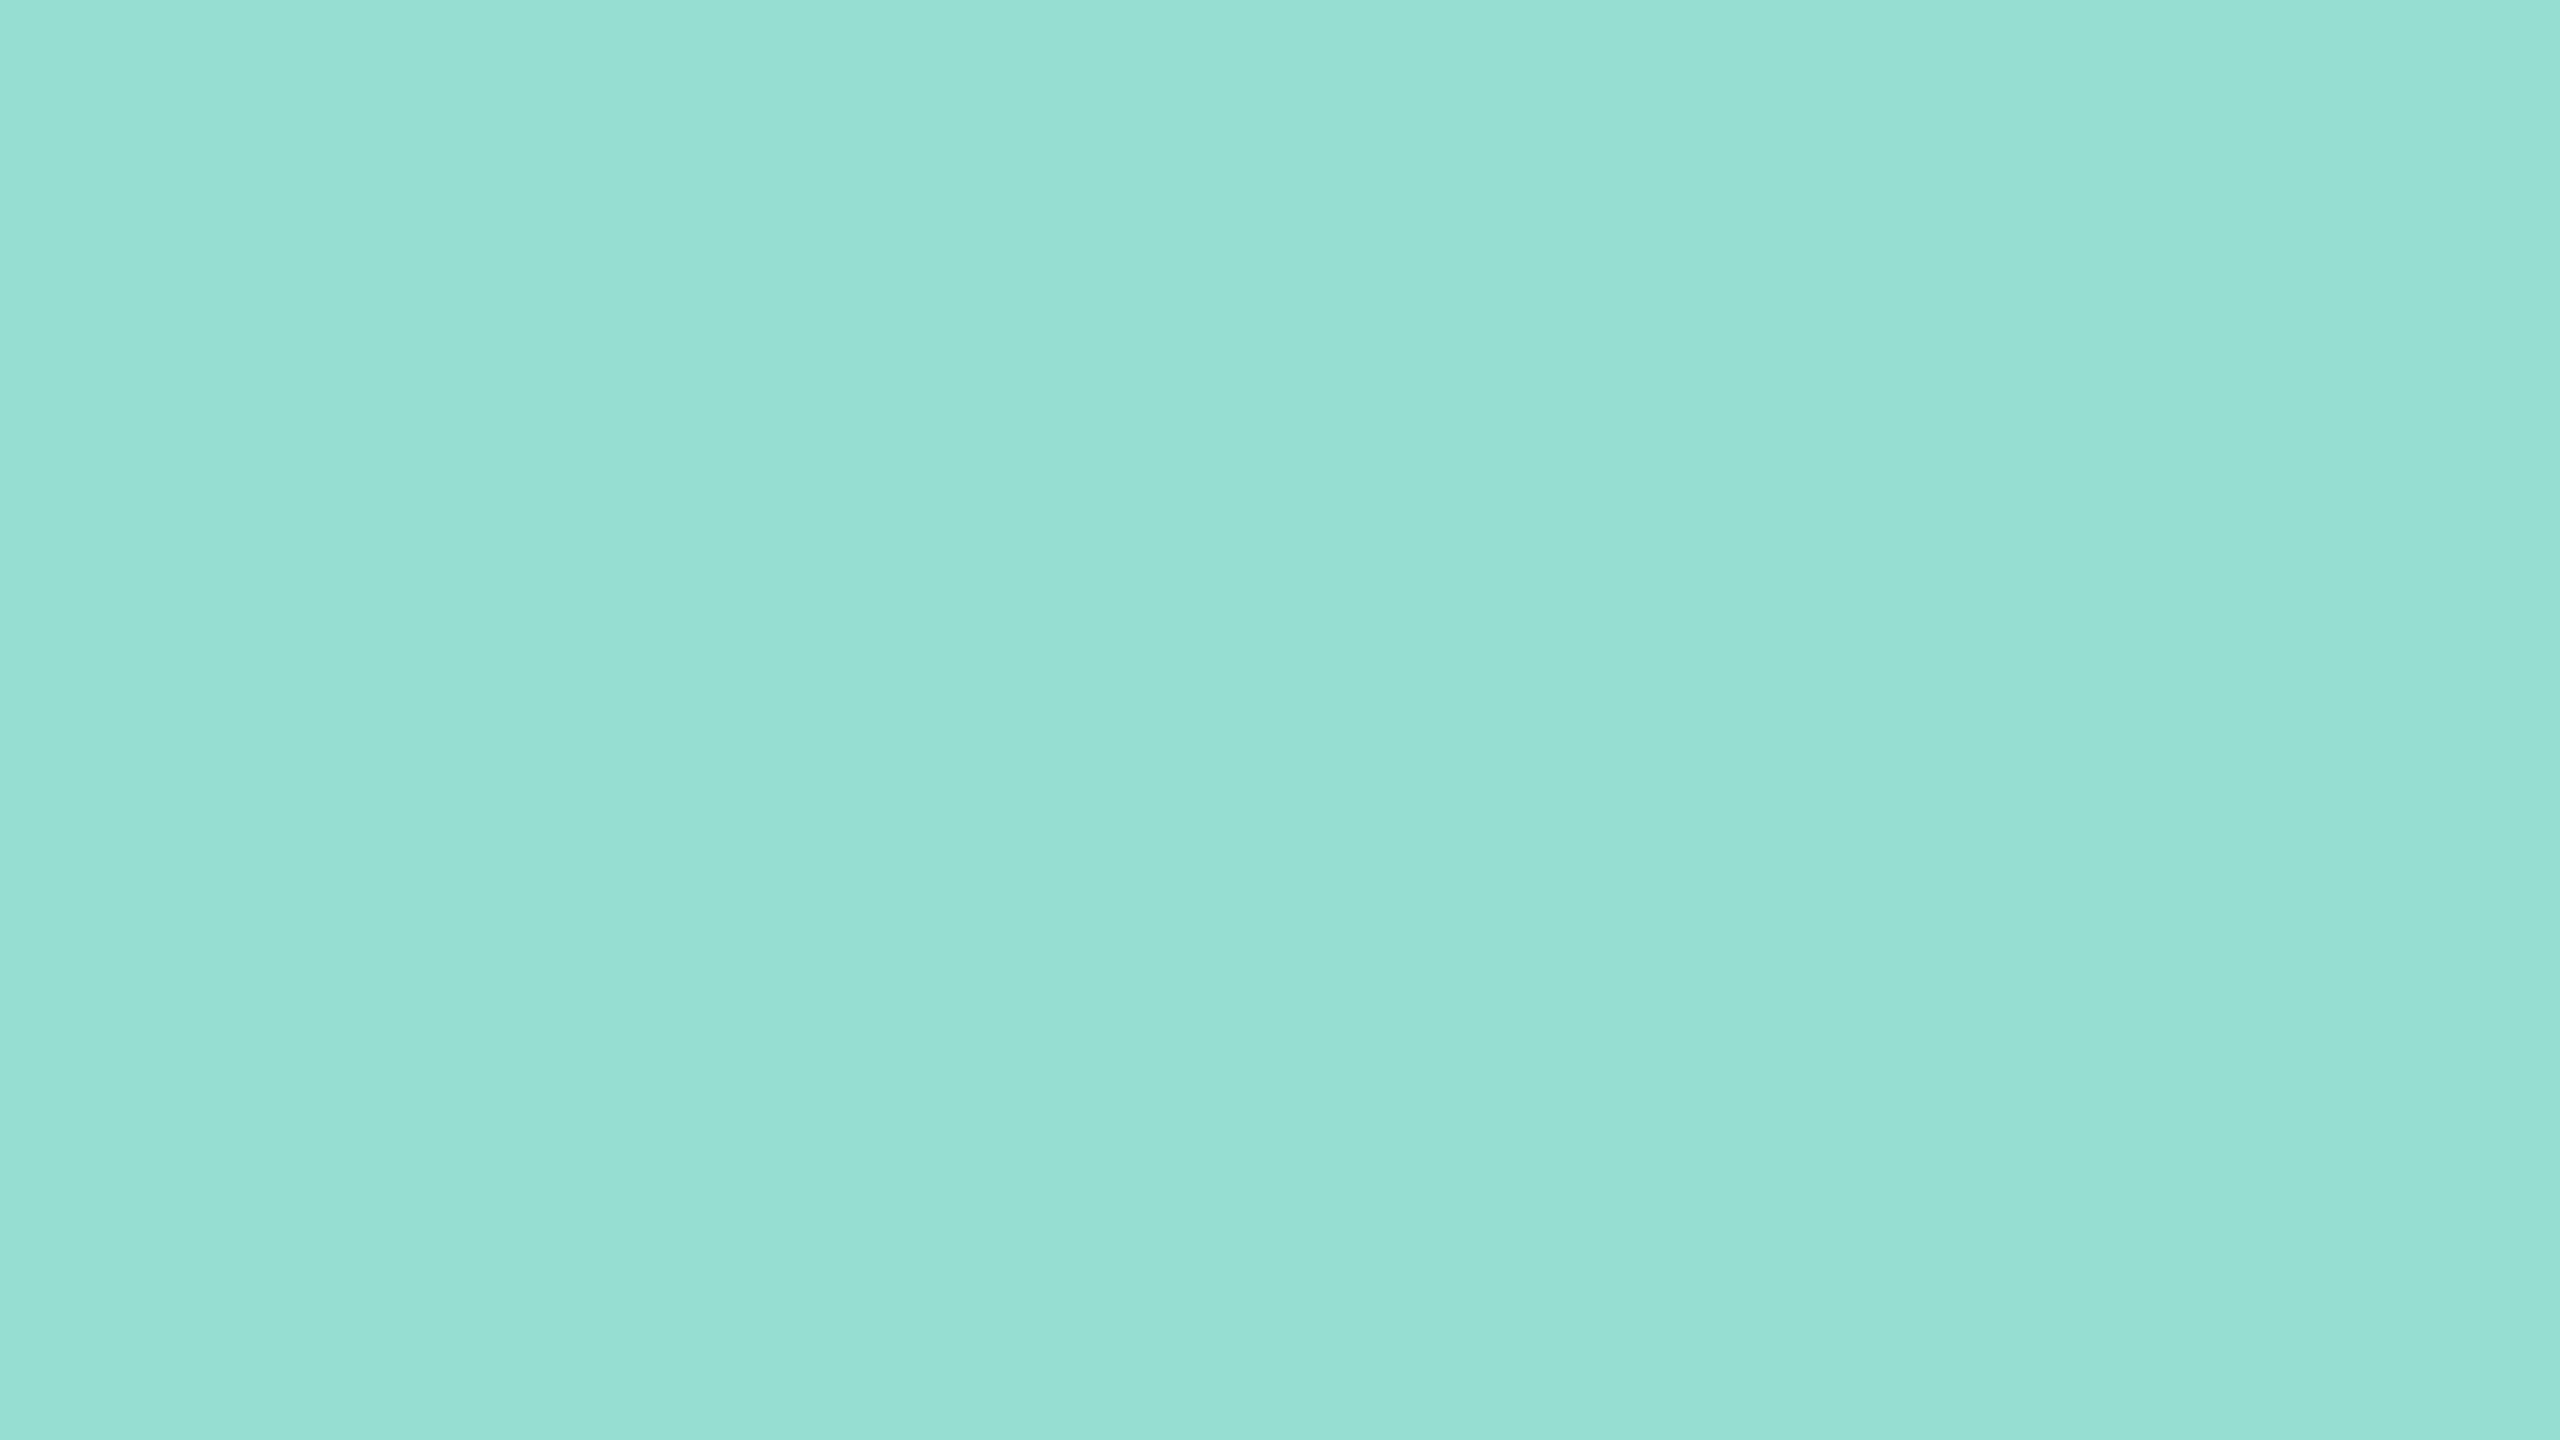 Pale Robin Egg Blue Tiffany Blue Background